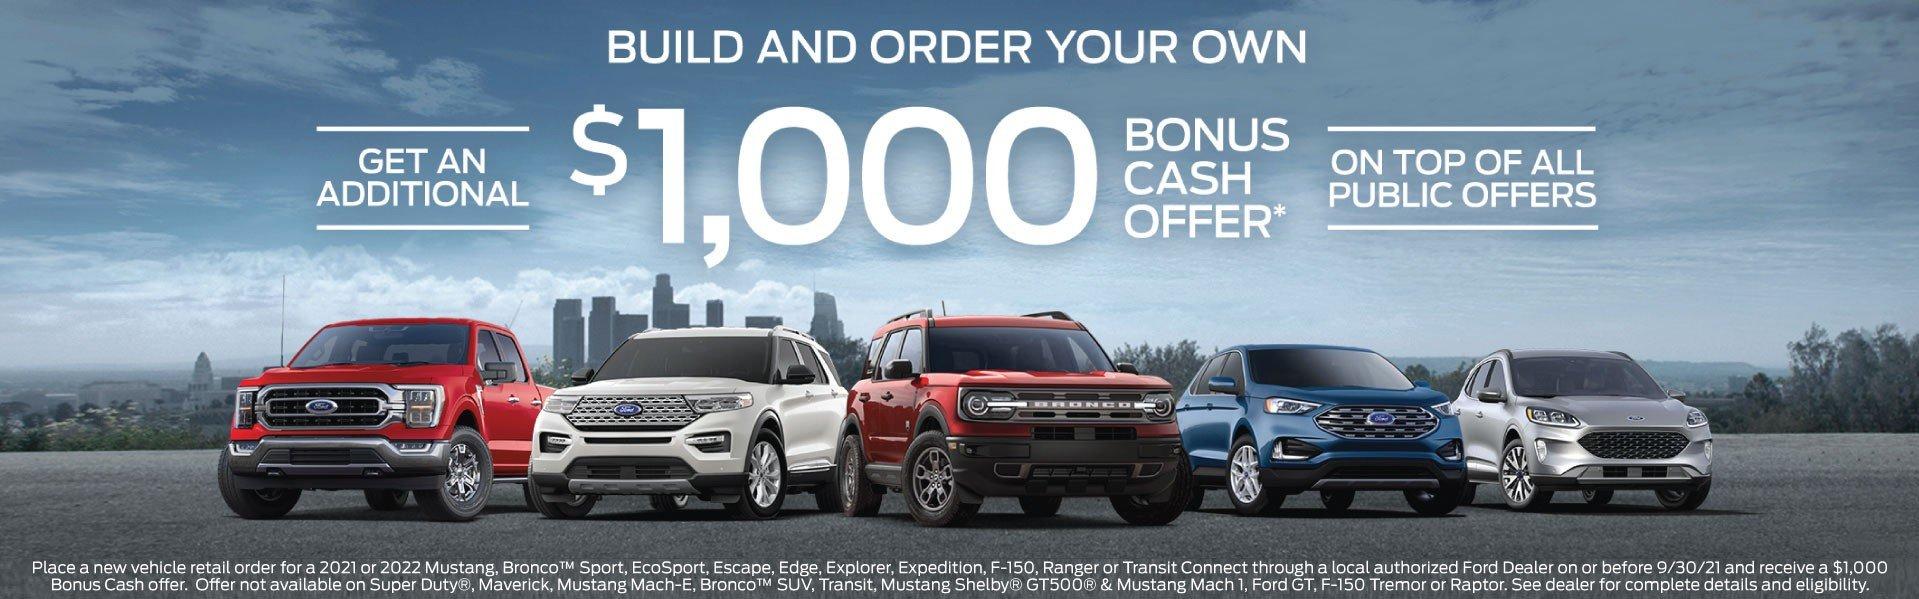 Bozard Ford Retail Order Incentive 9-30-21